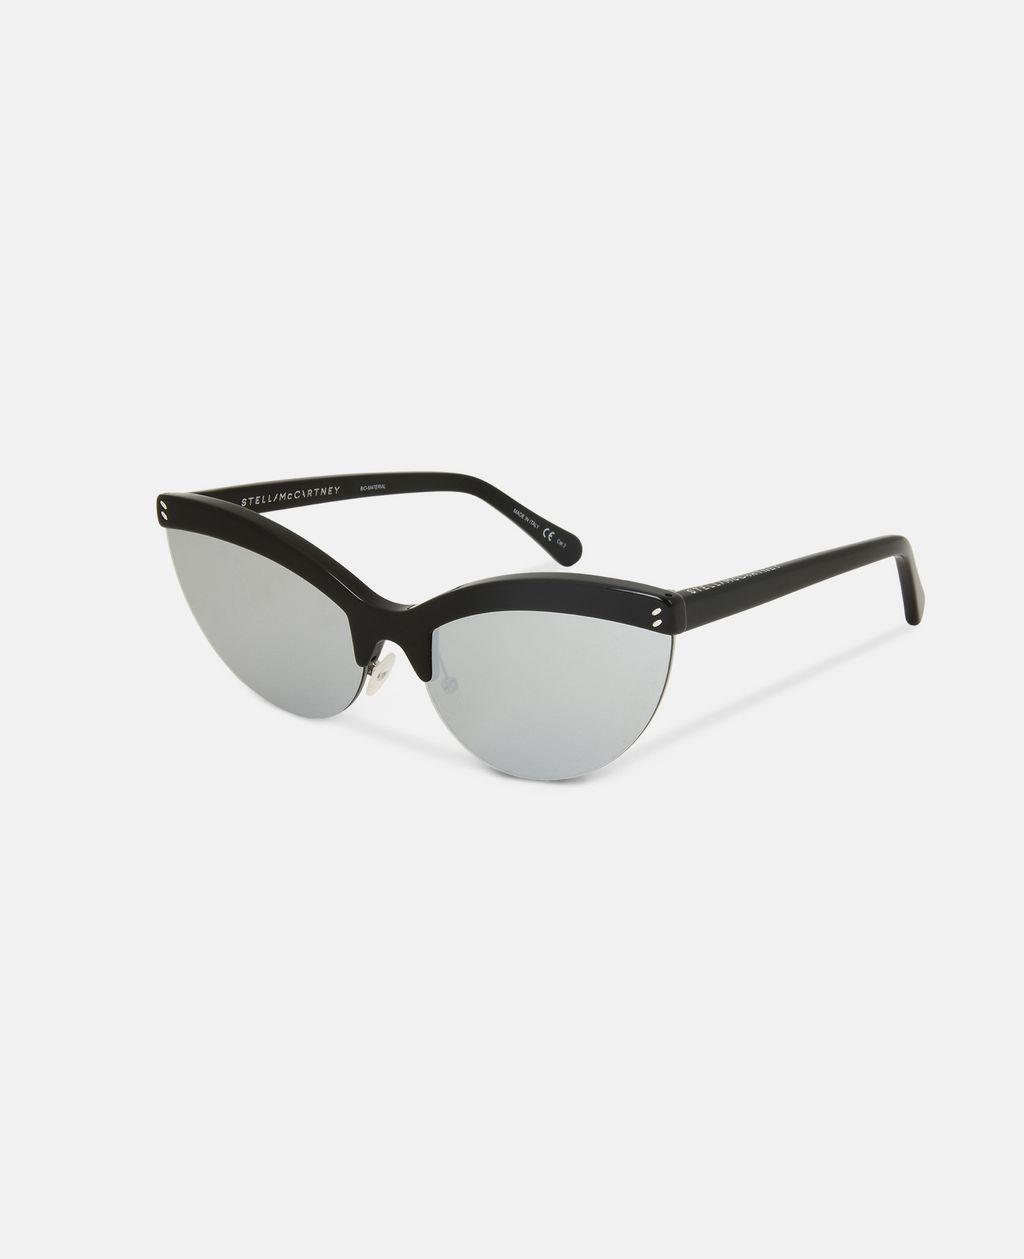 Black Semi-Rimless Cat Eye Sunglasses  - STELLA MCCARTNEY